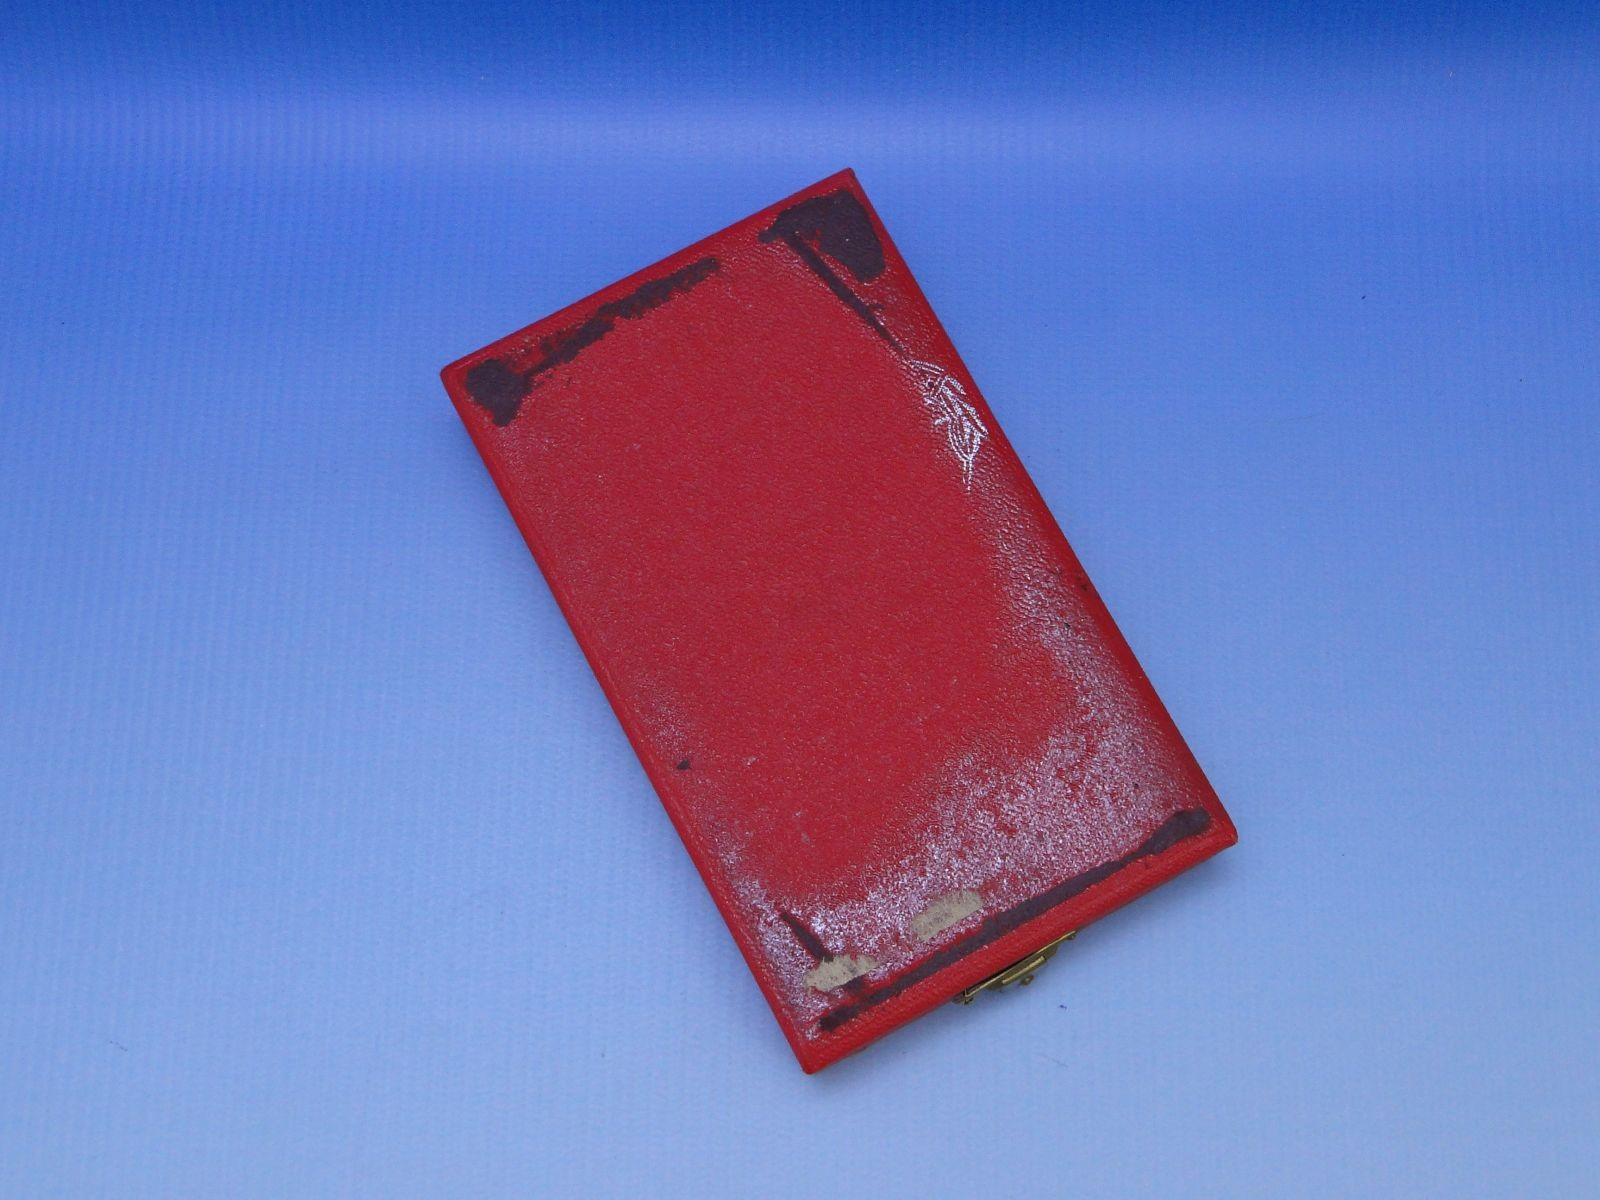 DSC02583.JPG (1600×1200)